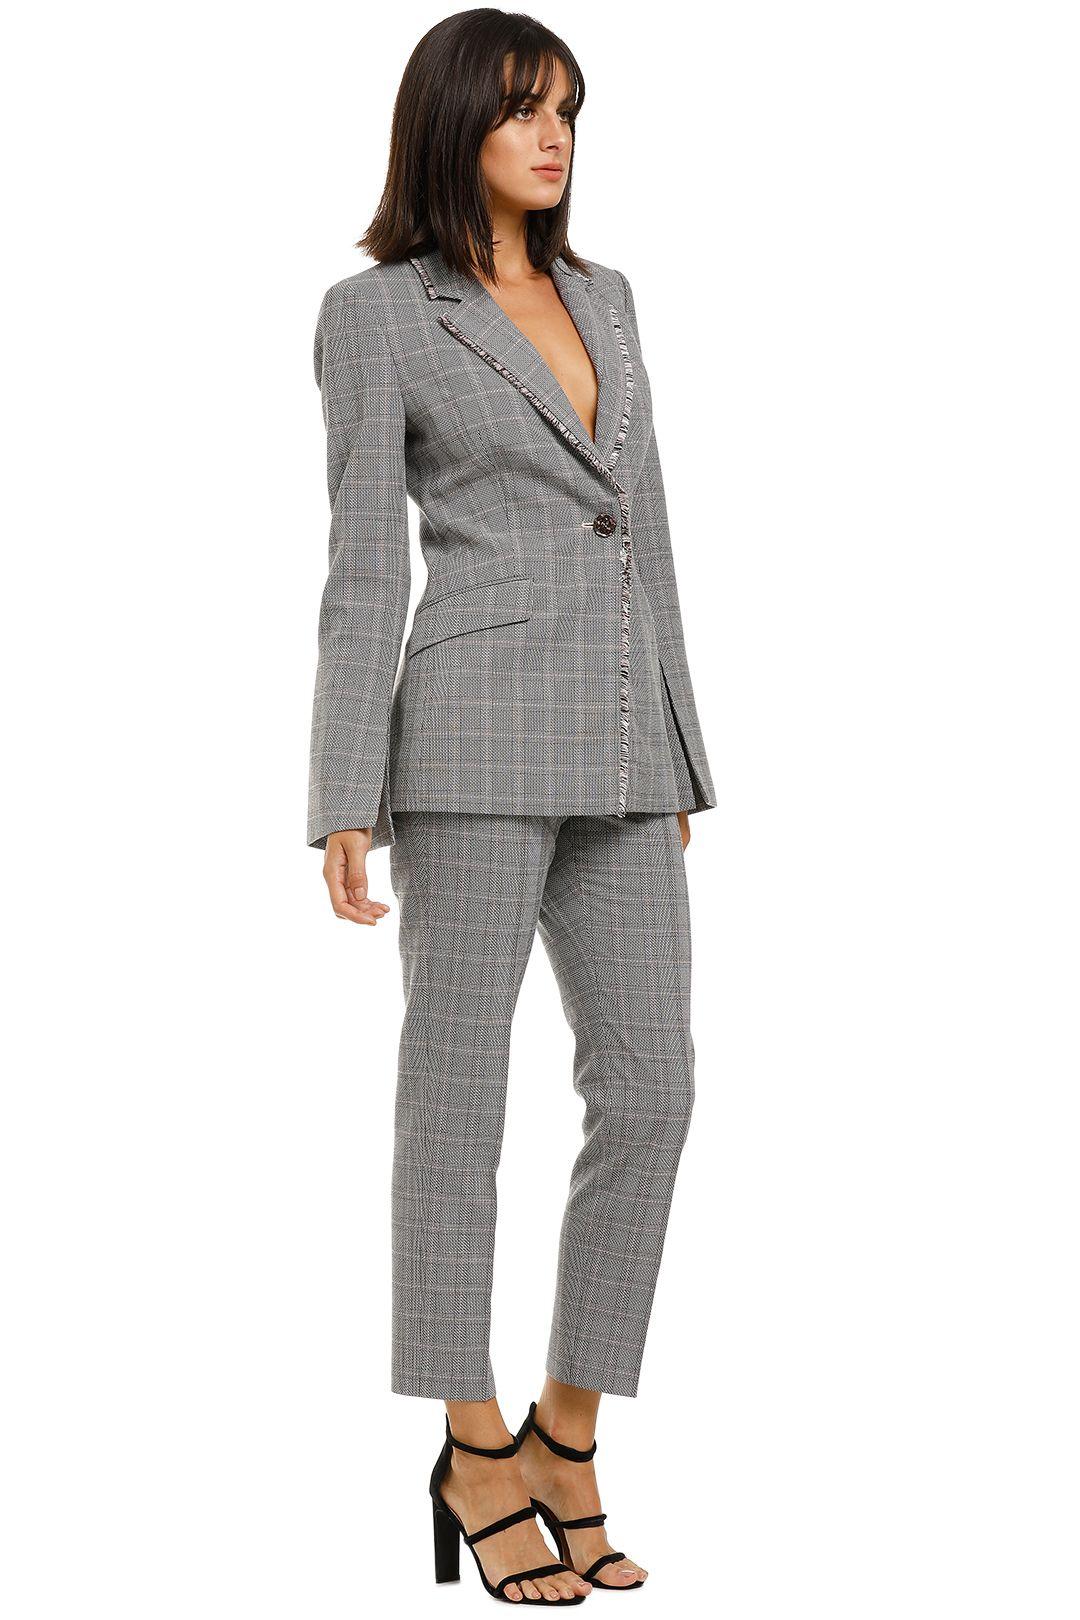 Rebecca-Vallance-Margot-Blazer-and-Slim-Pant-Set-Grey-Check-Side